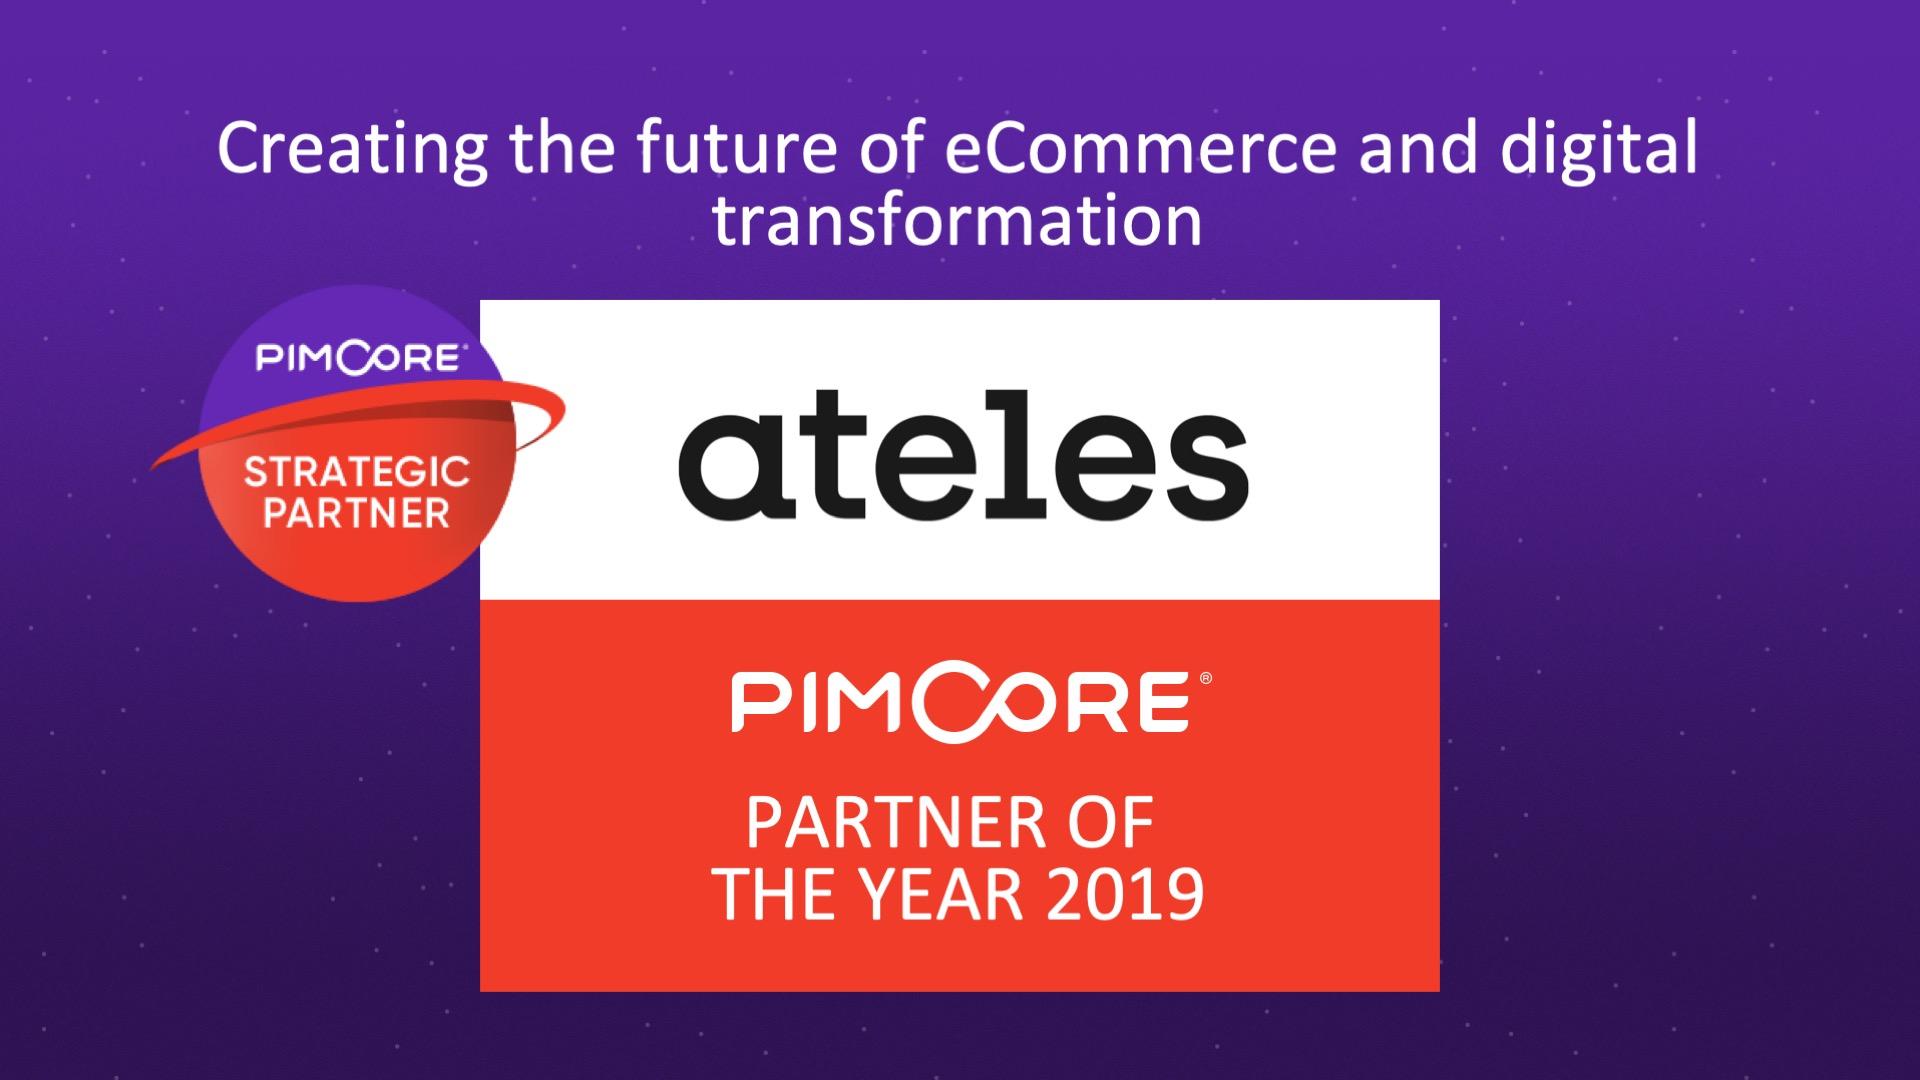 Ateles - Pimcore partner of the year.jpg